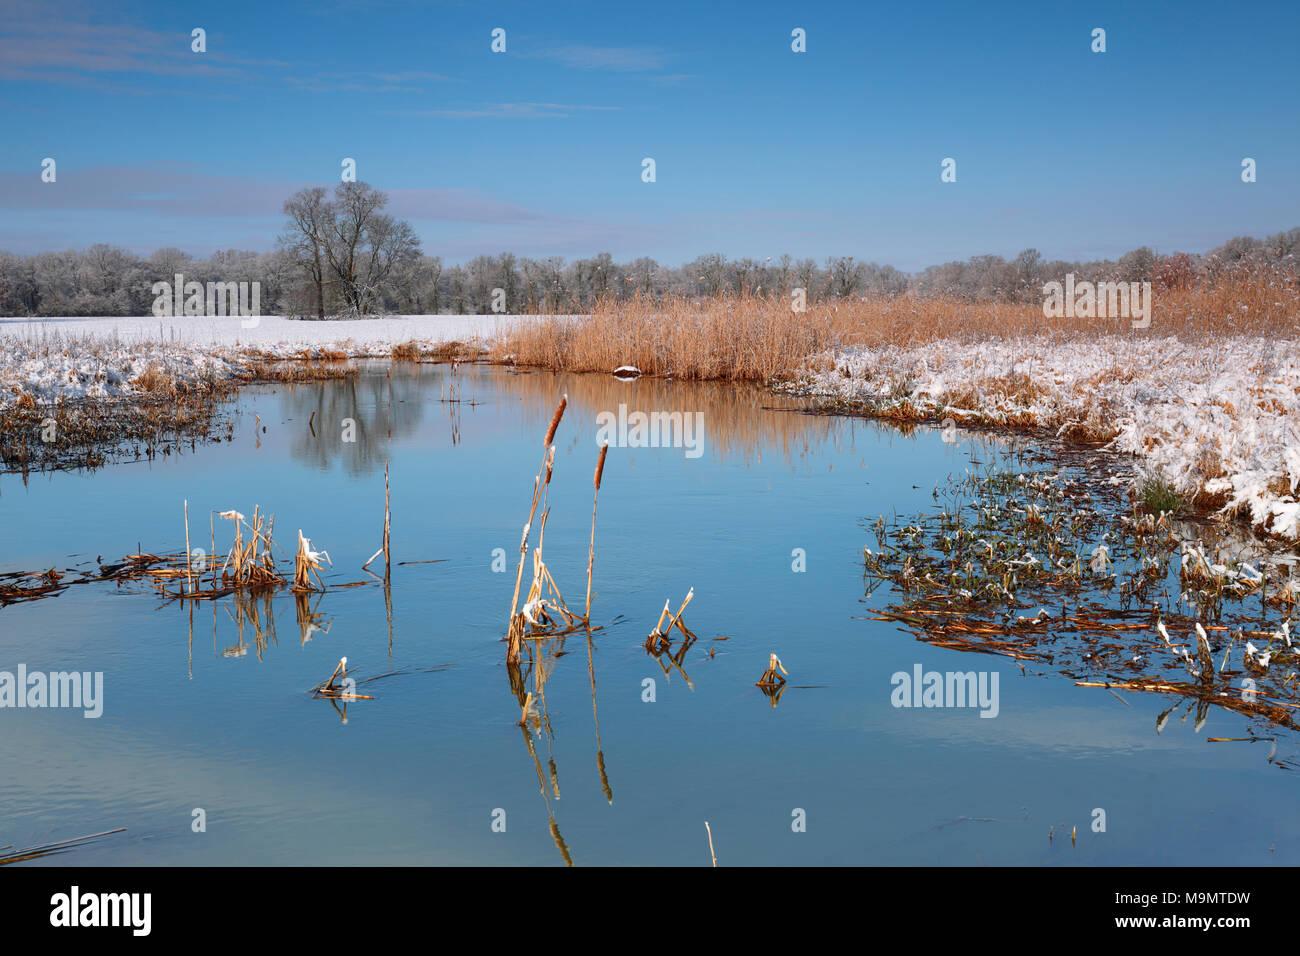 Wetland landscape in winter, Biosphere Reserve Middle Elbe, Dessau-Roßlau, Saxony-Anhalt, Germany - Stock Image